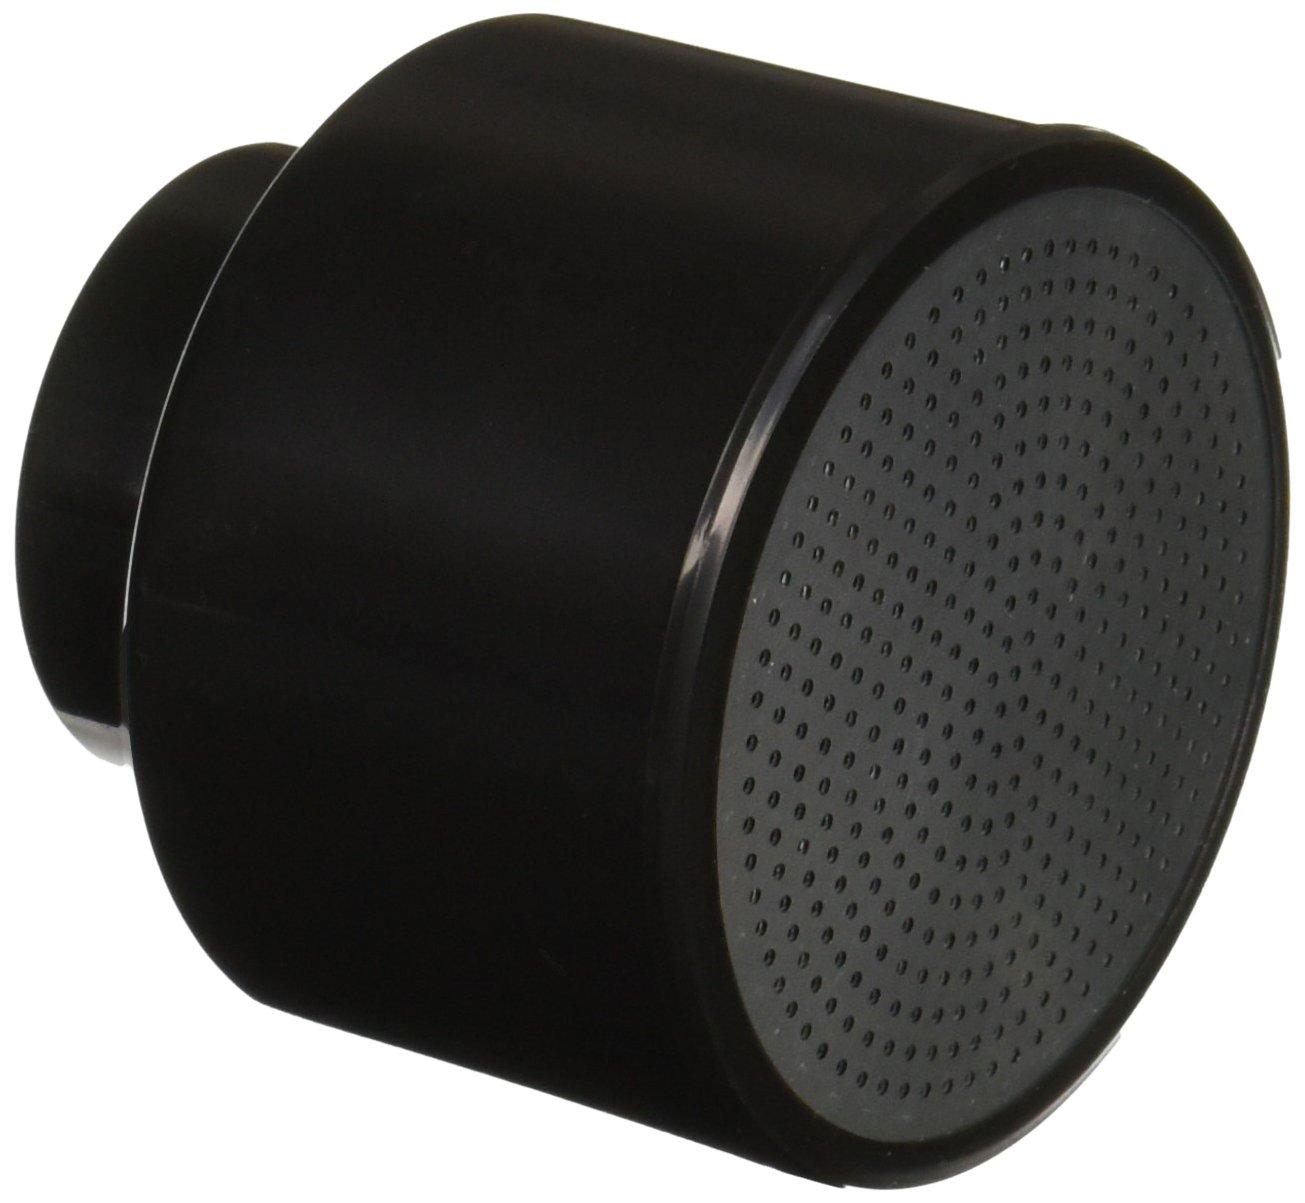 DRAMM 400 WATER BREAKER NOZZLE, BLACK